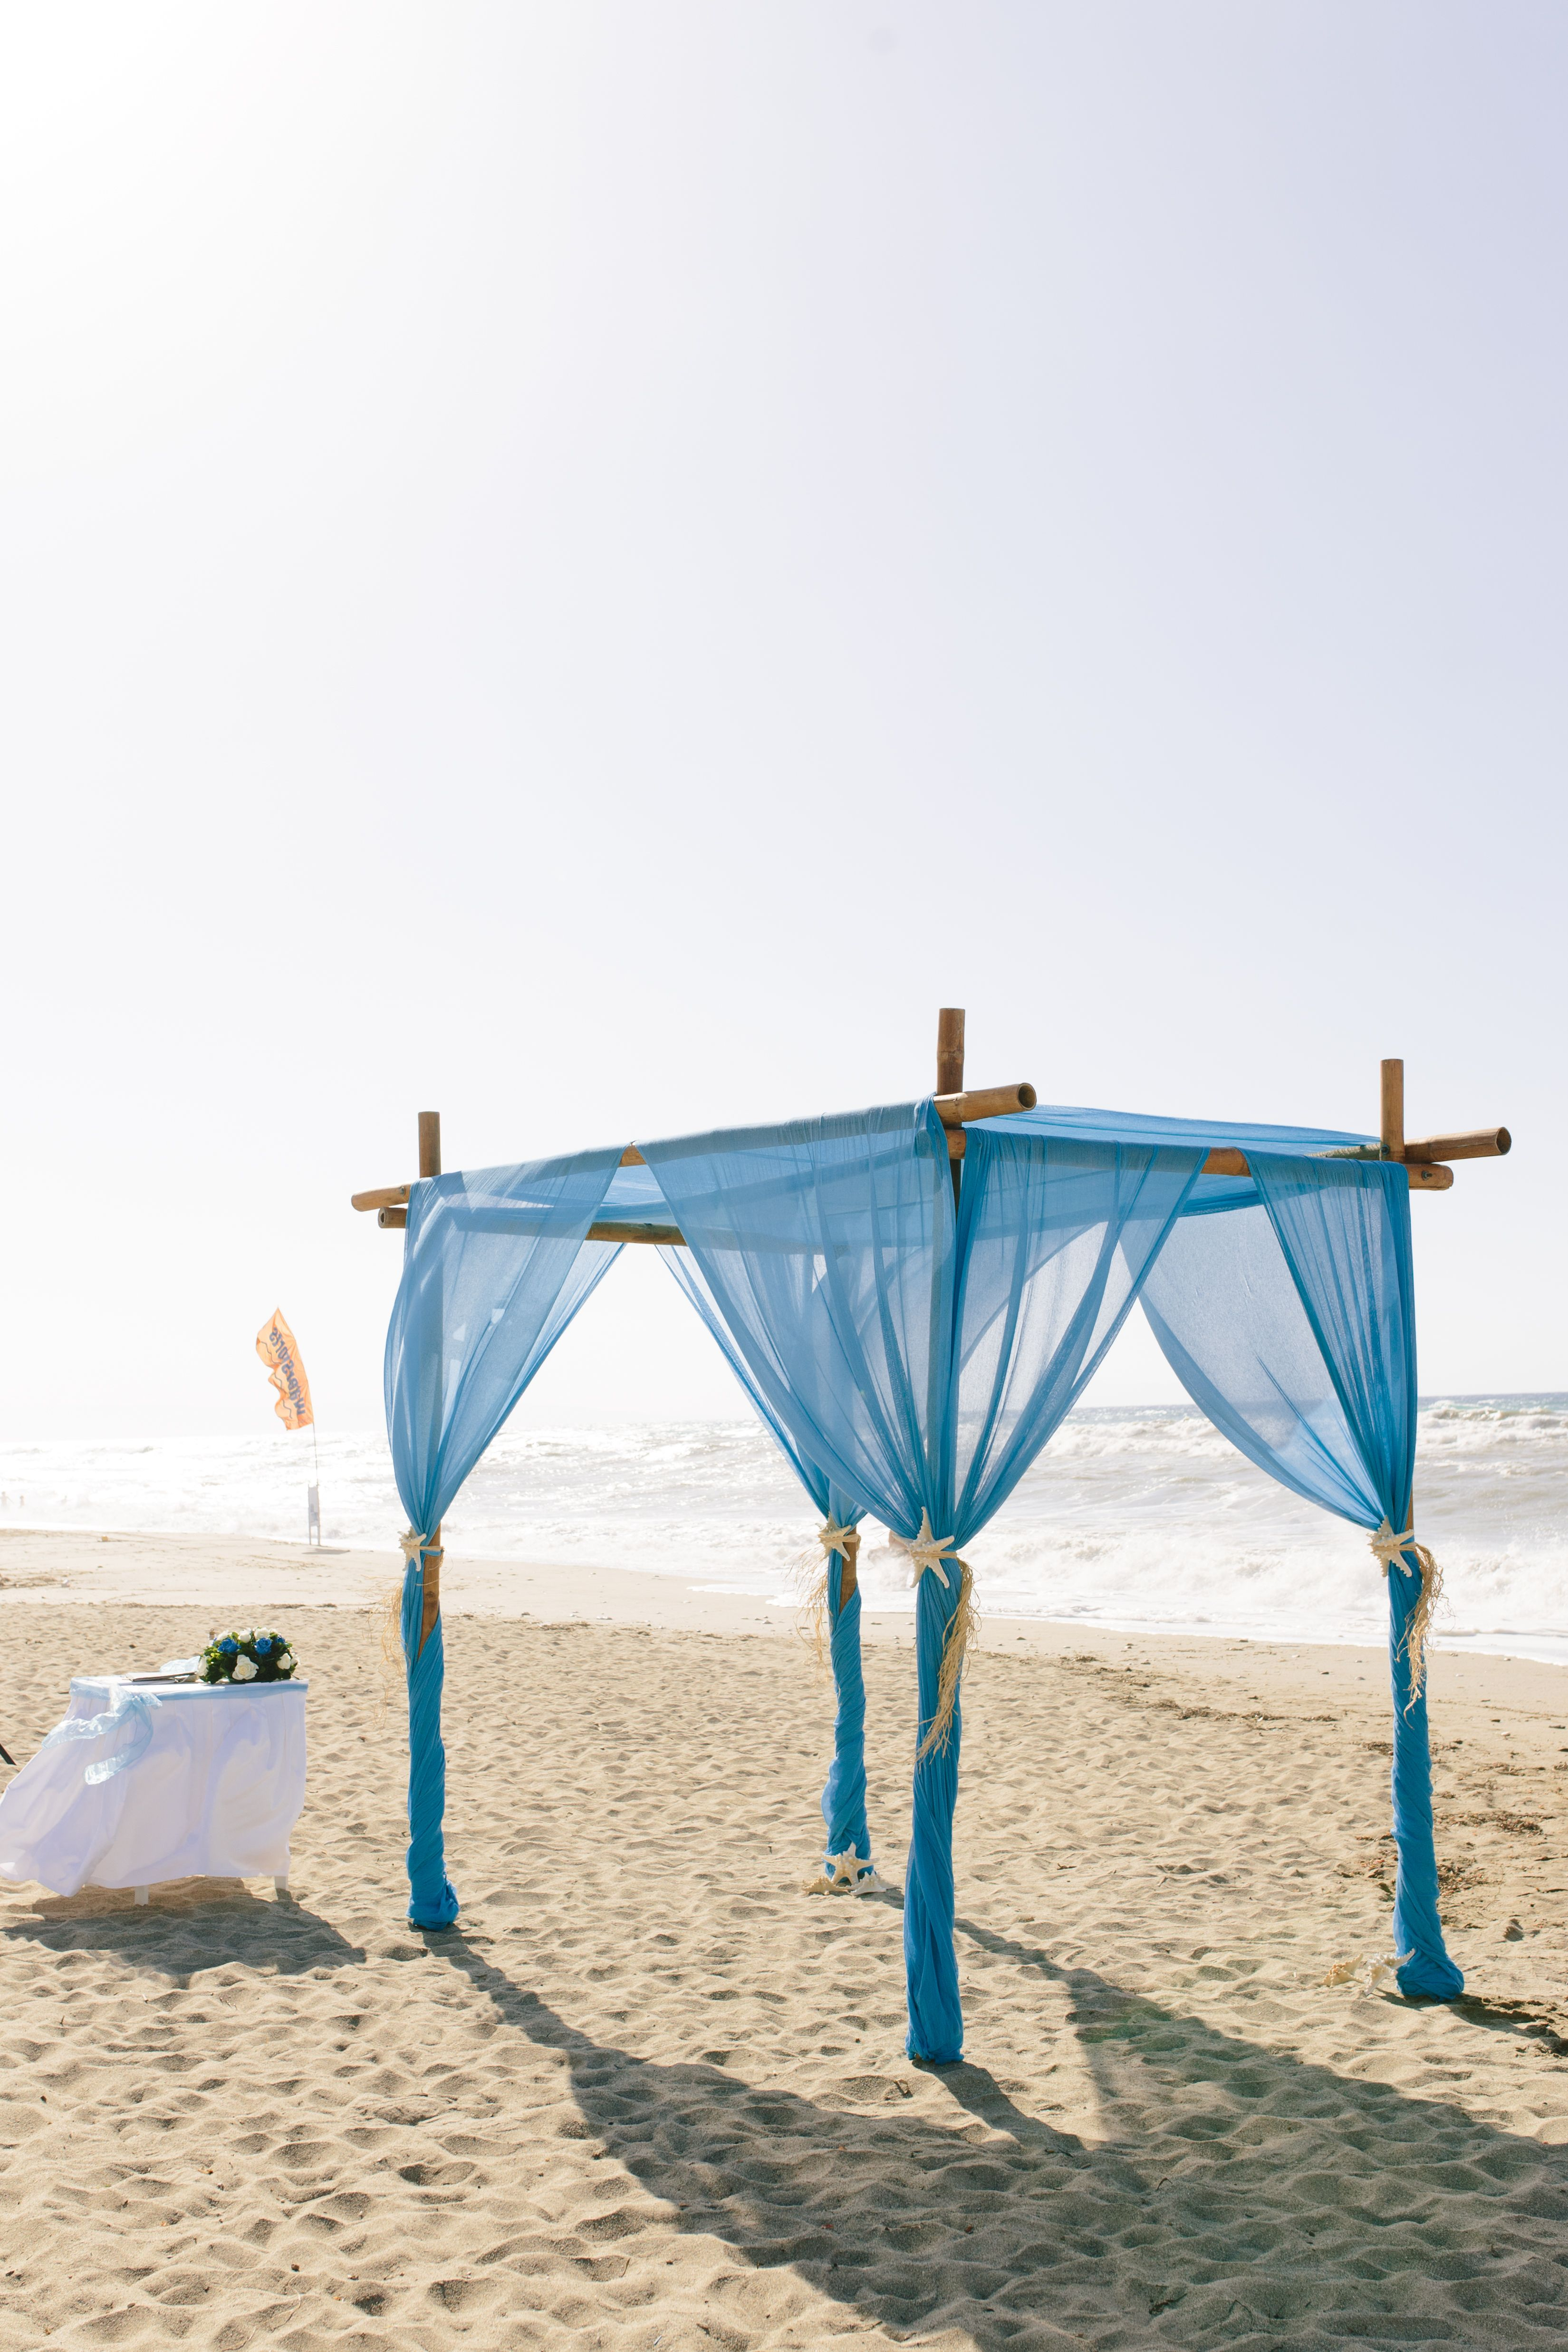 Canopy Arch Blue Drapes Curtains Fabric Sea Seashell Shell